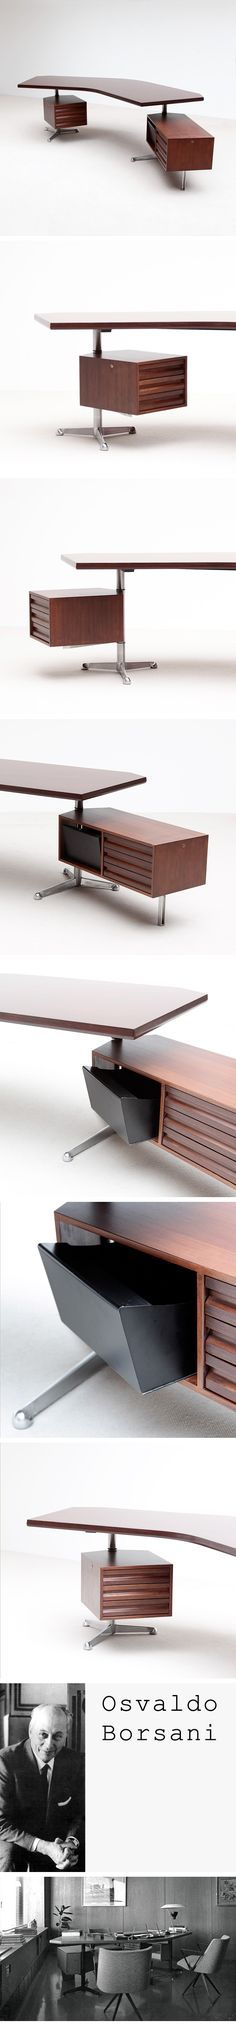 T96 Executive Desk by Osvaldo Borsani